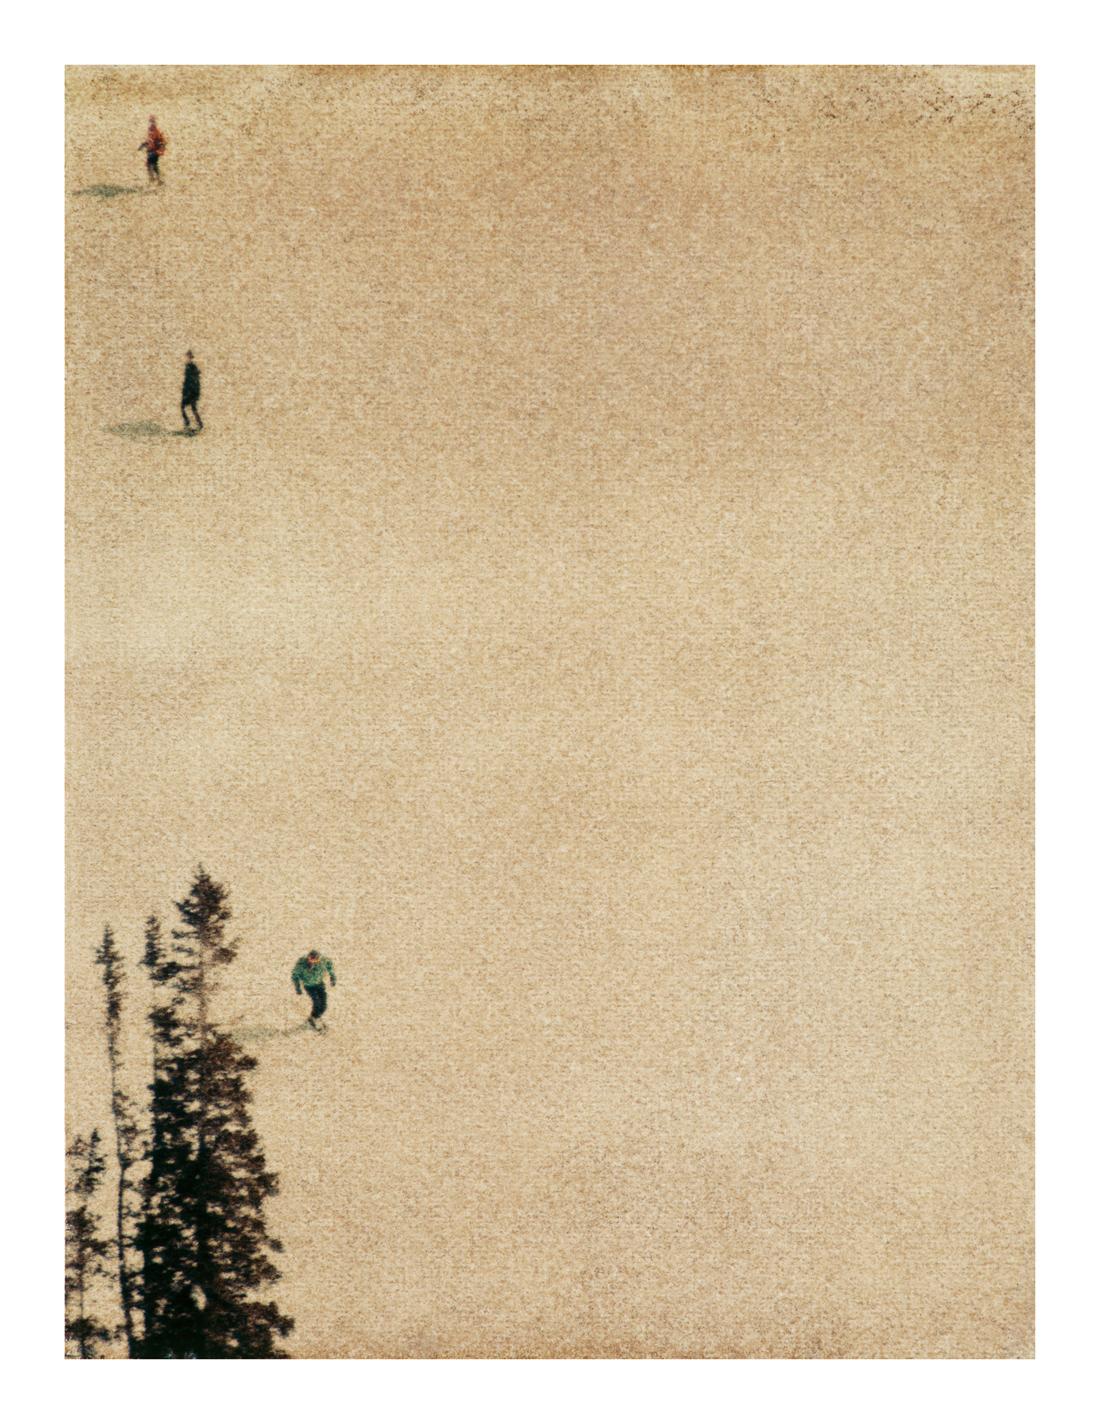 Aspen #1, 2007 (1996)